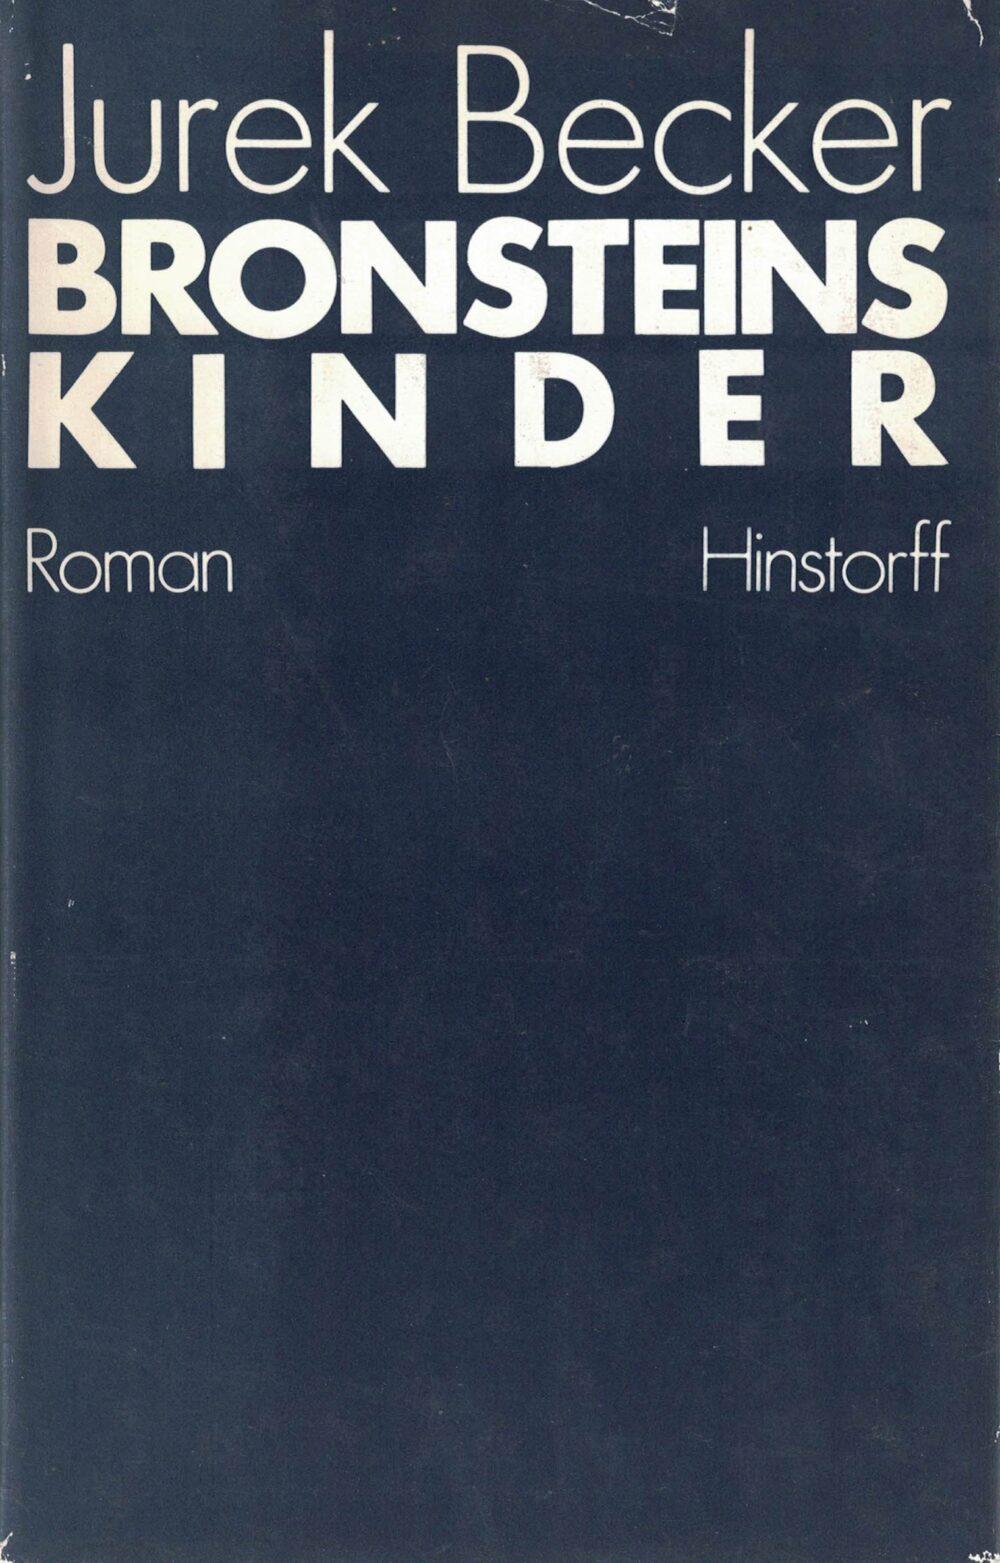 Jurek Becker - Bronsteins Kinder - Roman